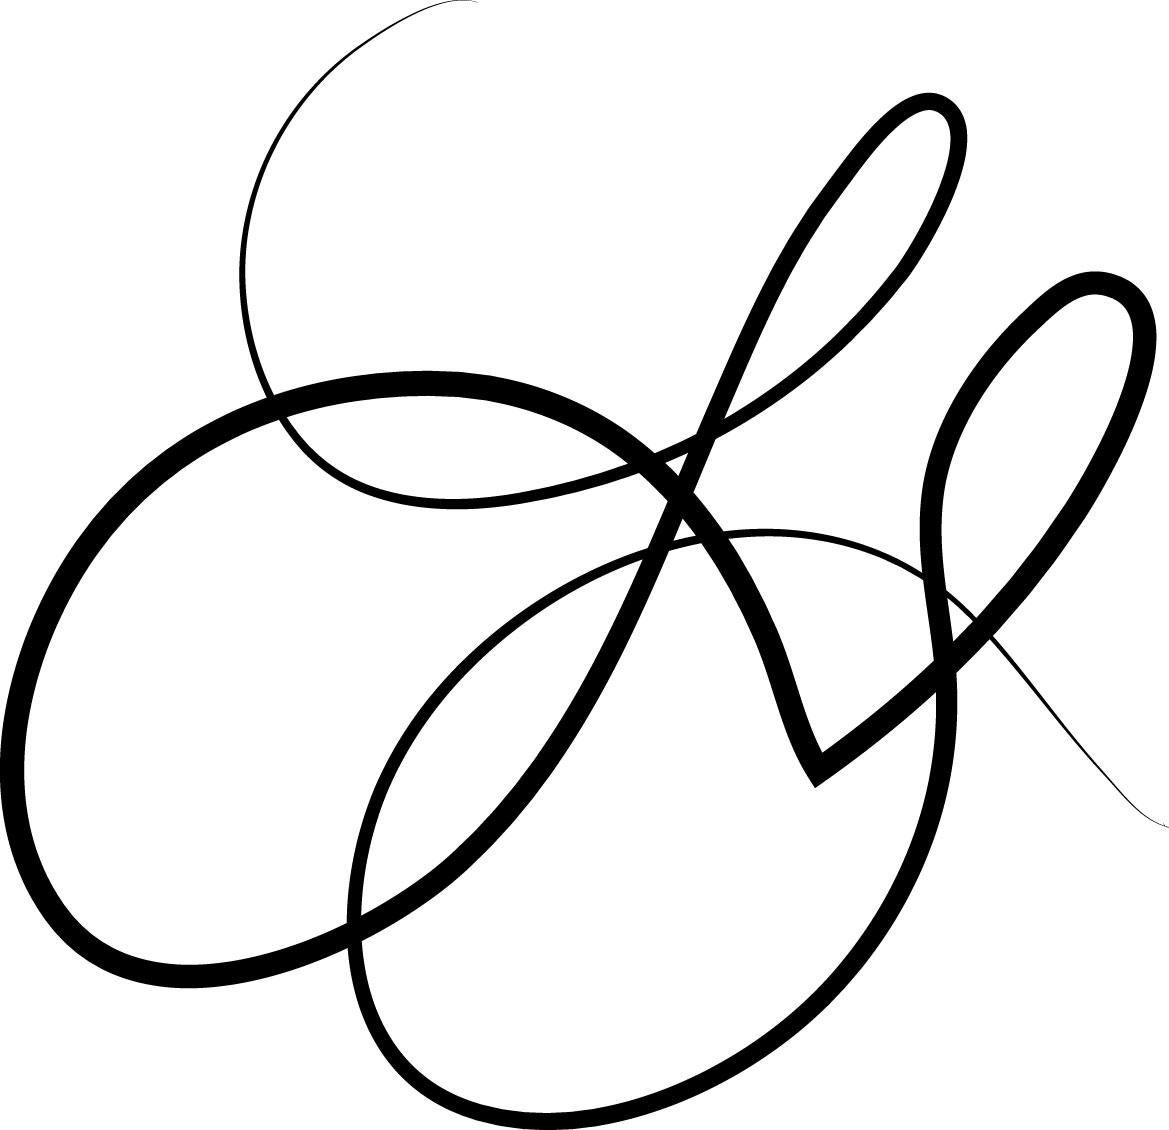 Saba Styles's Signature